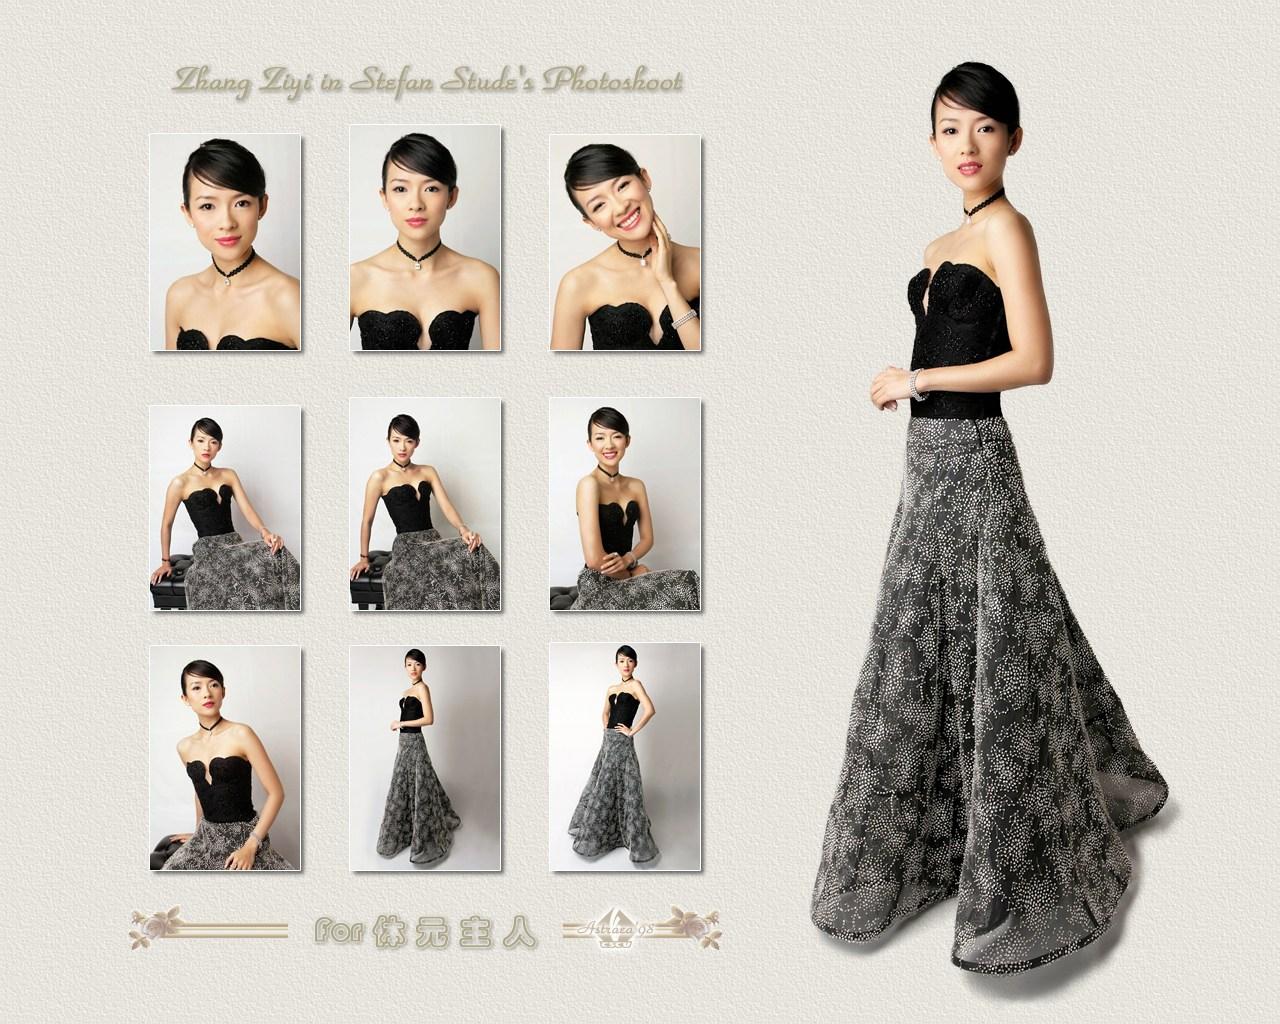 http://1.bp.blogspot.com/_VXLxYDVwKNs/TFe4HYlWg8I/AAAAAAAAADs/9gd6ME3MVaE/s1600/ziyi-stude-photoshoot-wallpaper.jpg